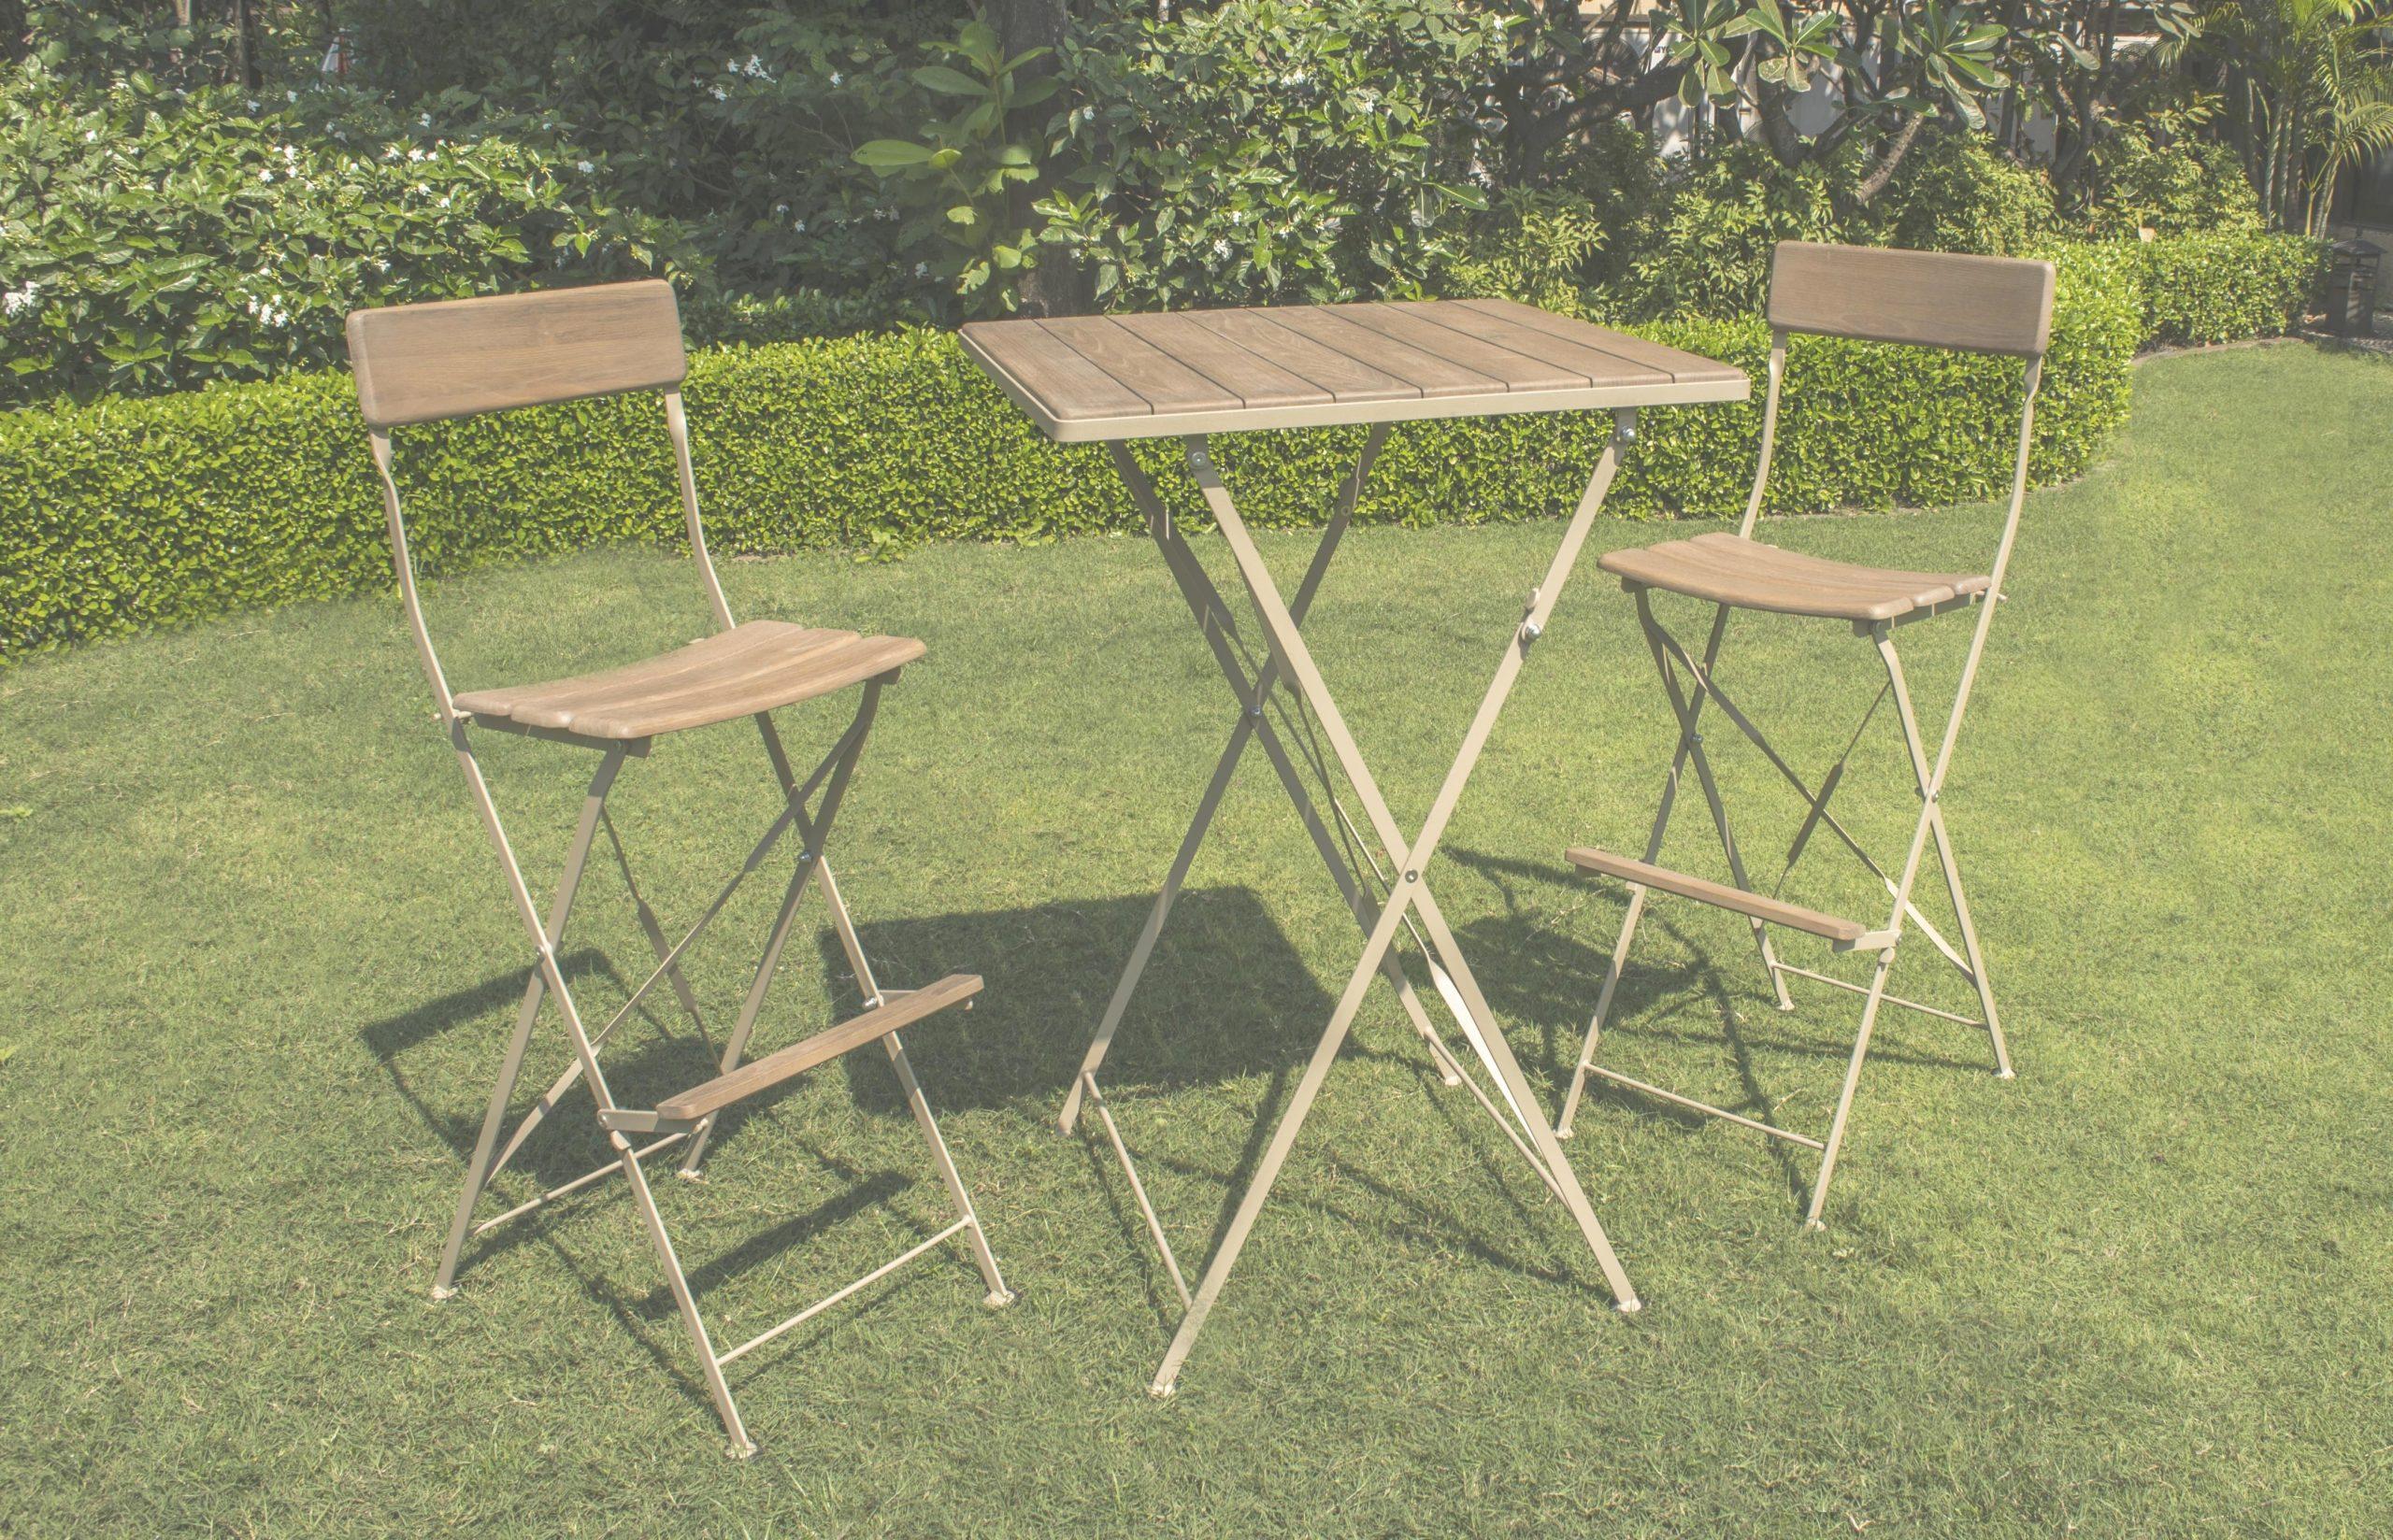 Salon De Jardin Intermarche 2018 Luxe Inspirational ... pour Table De Jardin Intermarché